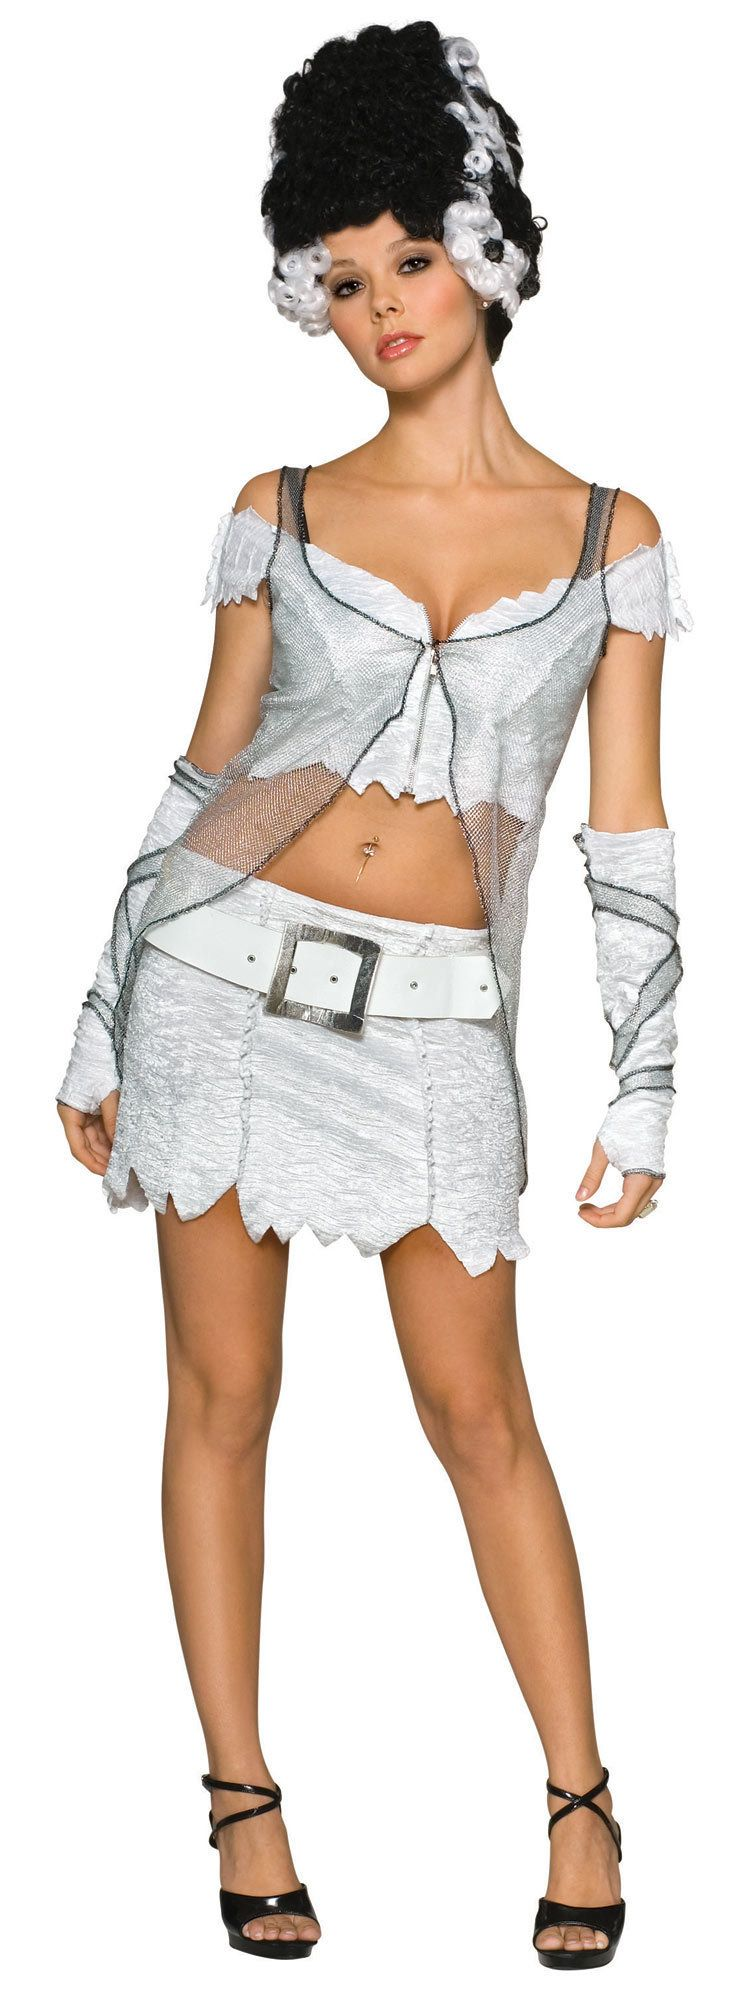 "Sexy <a href=""http://www.costumecraze.com/SA714.html"">Bride of Frankenstein</a>, anyone?"